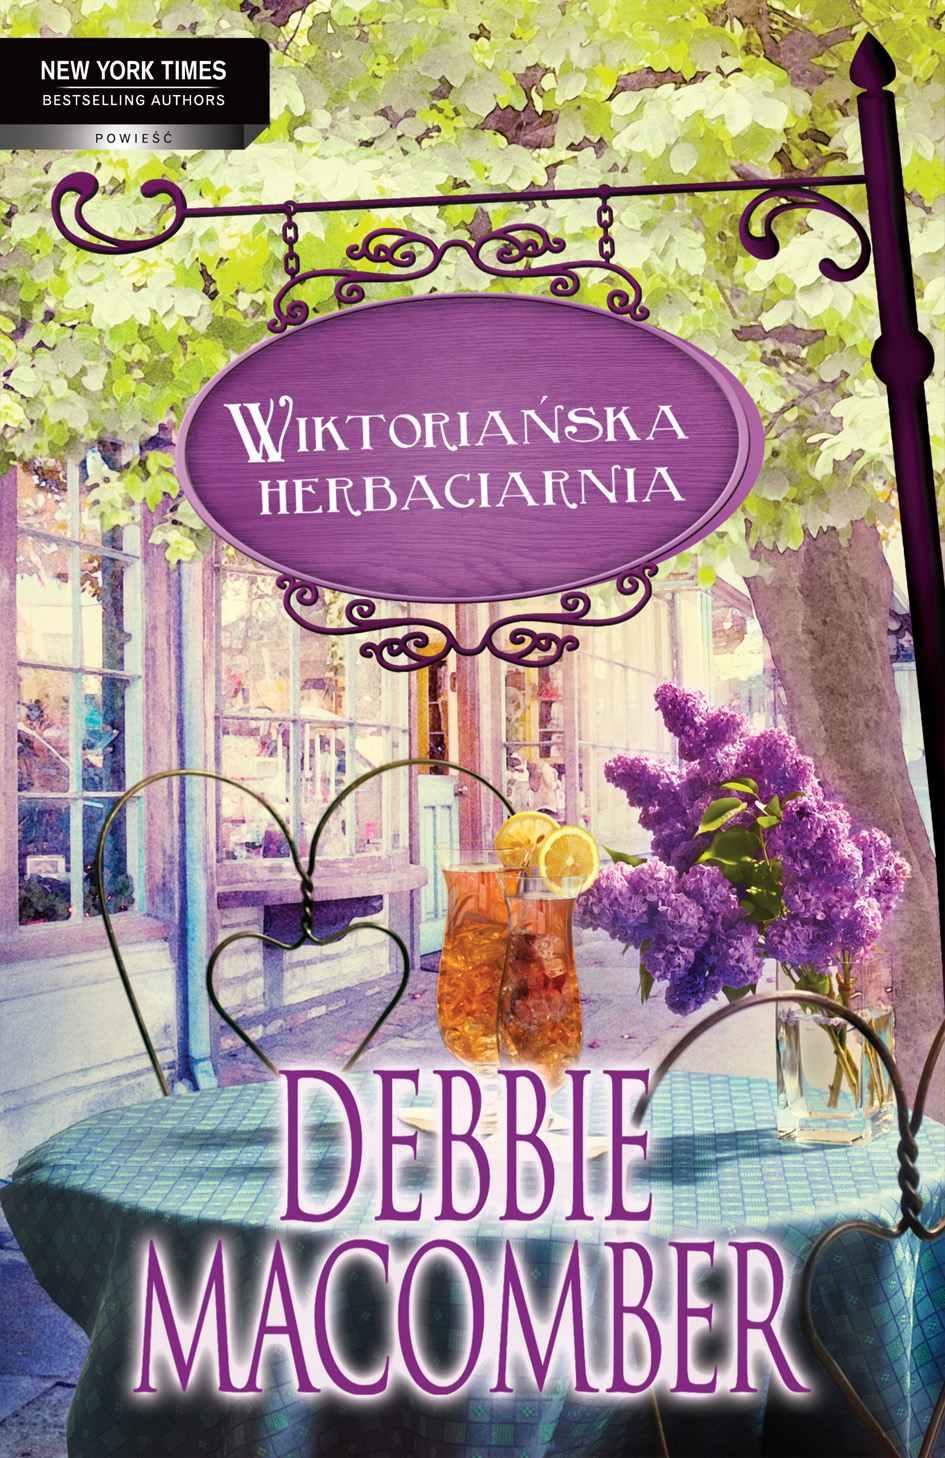 Wiktoriańska herbaciarnia - Ebook (Książka EPUB) do pobrania w formacie EPUB